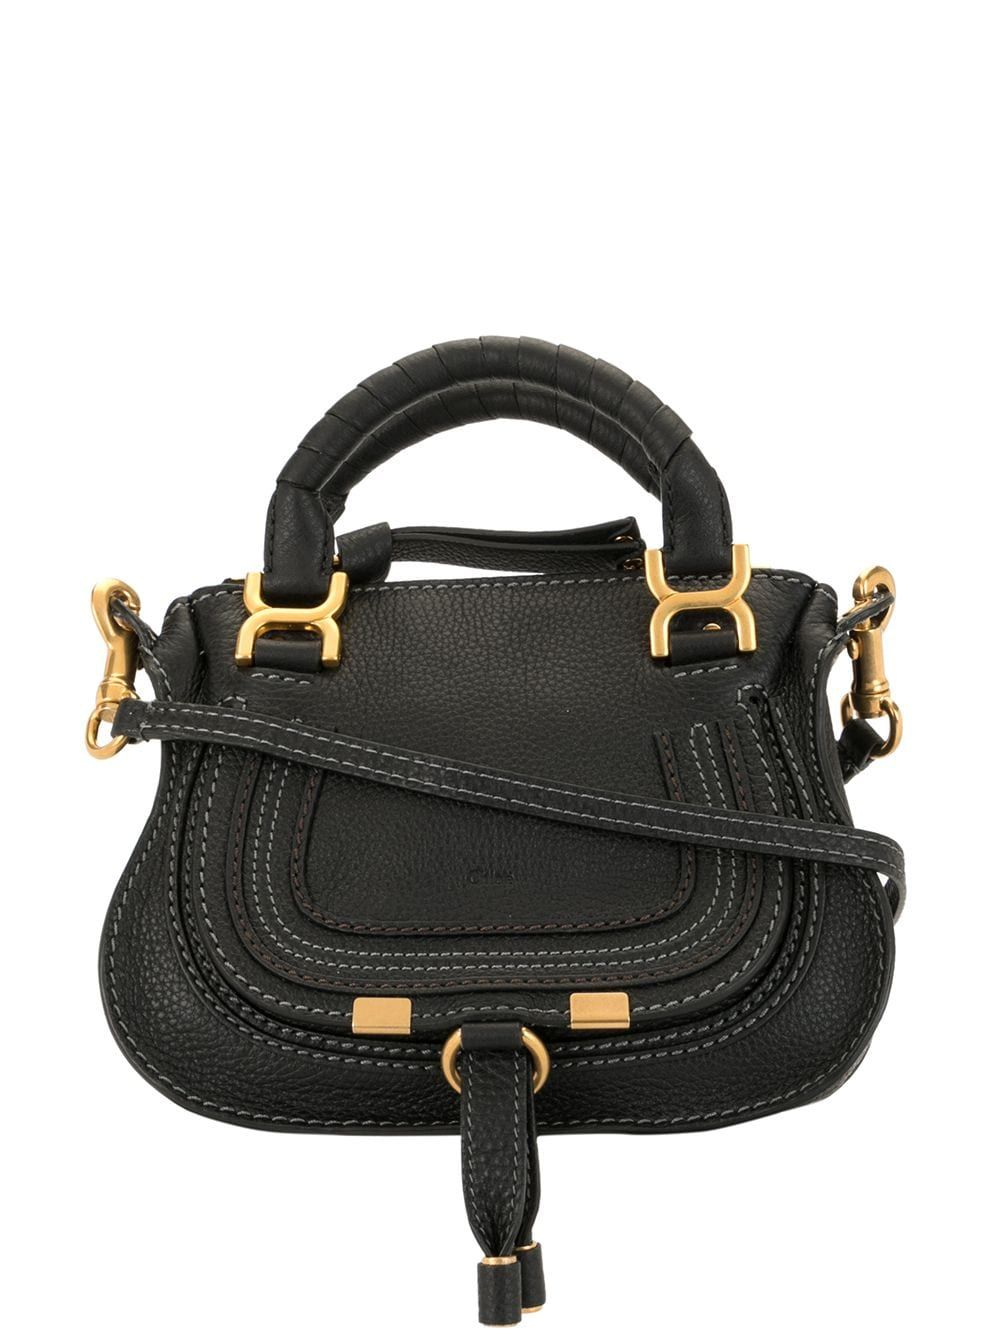 Marcie mini leather bag